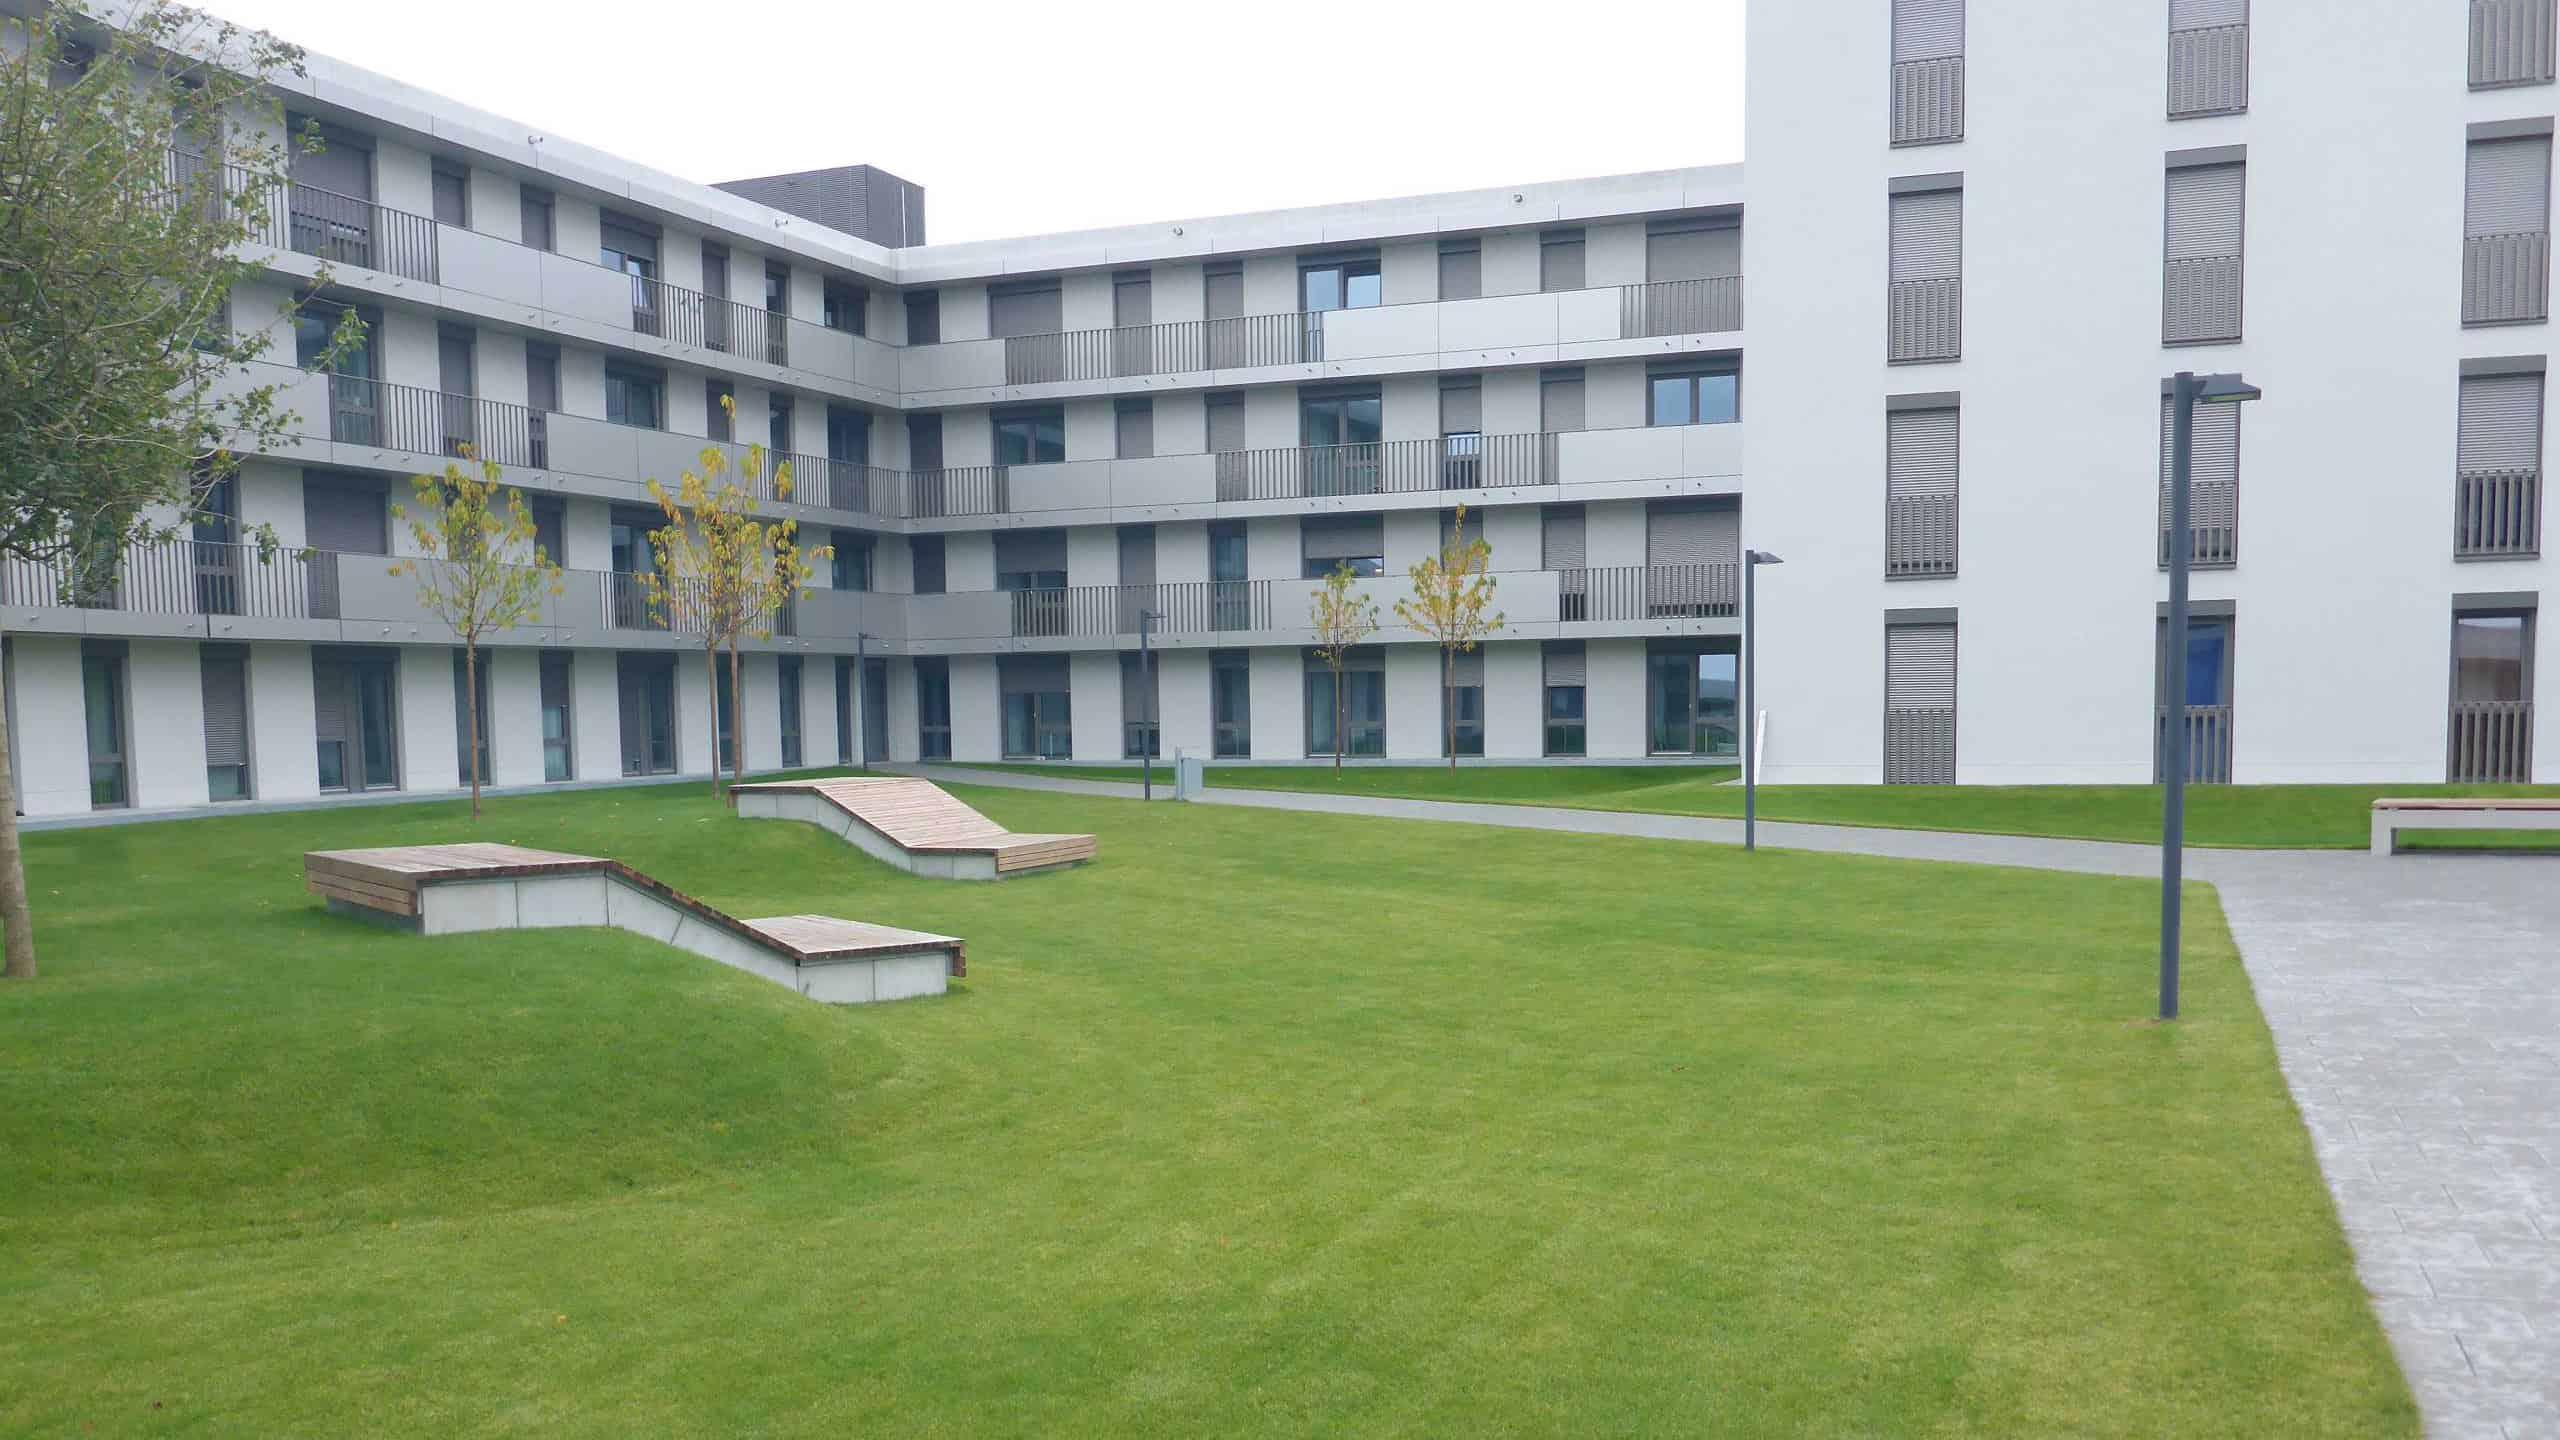 Bild: Pilotprojekt Azubiwohnen am Innsbrucker Ring, grüner Innenhof, Foto: ver.de landschaftsarchitektur